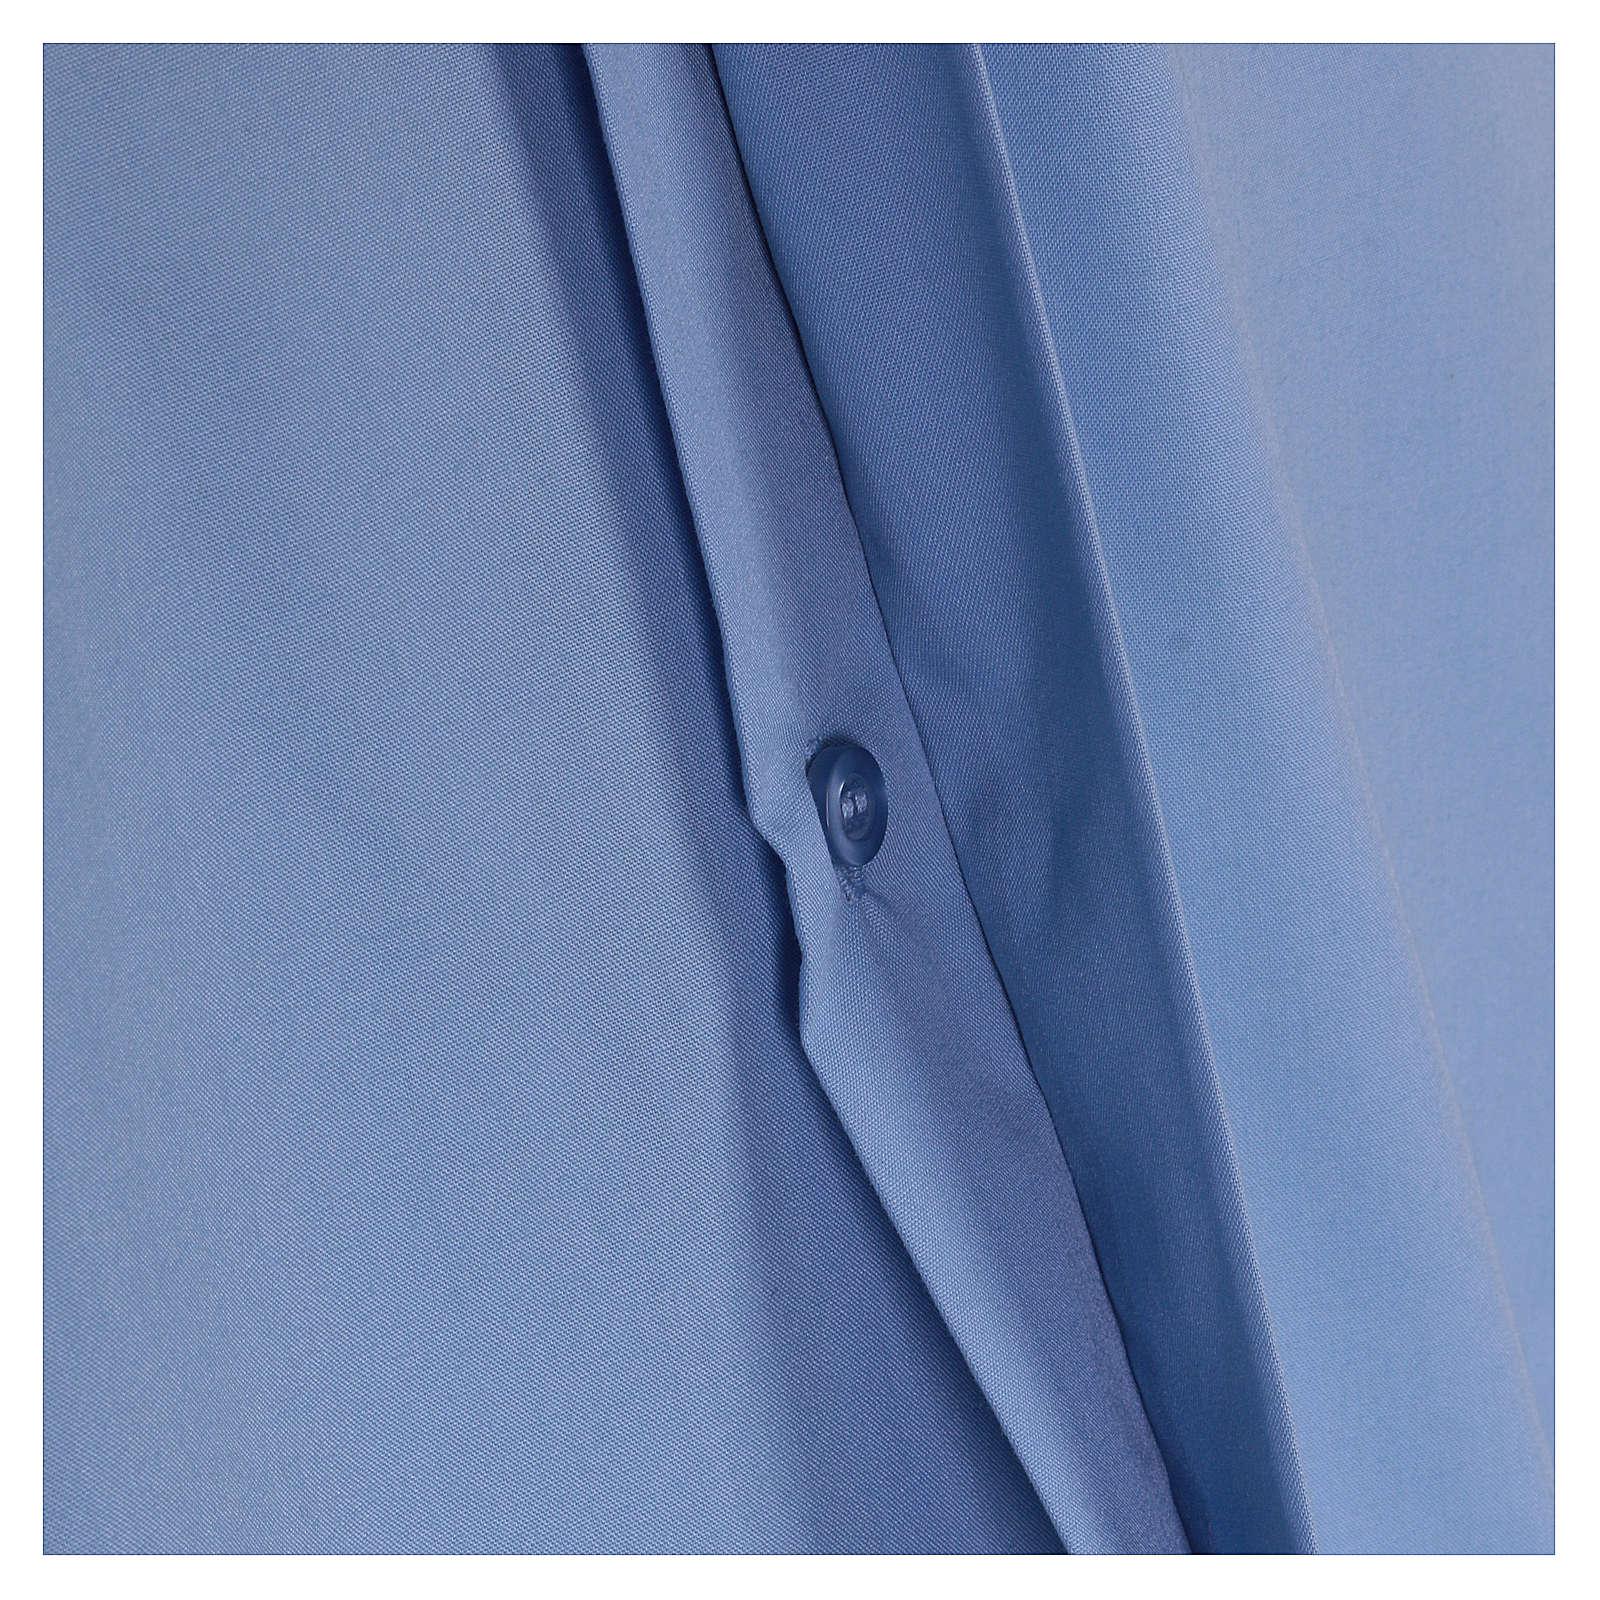 Camisa clergyman manga corta mixto algodón celeste 4